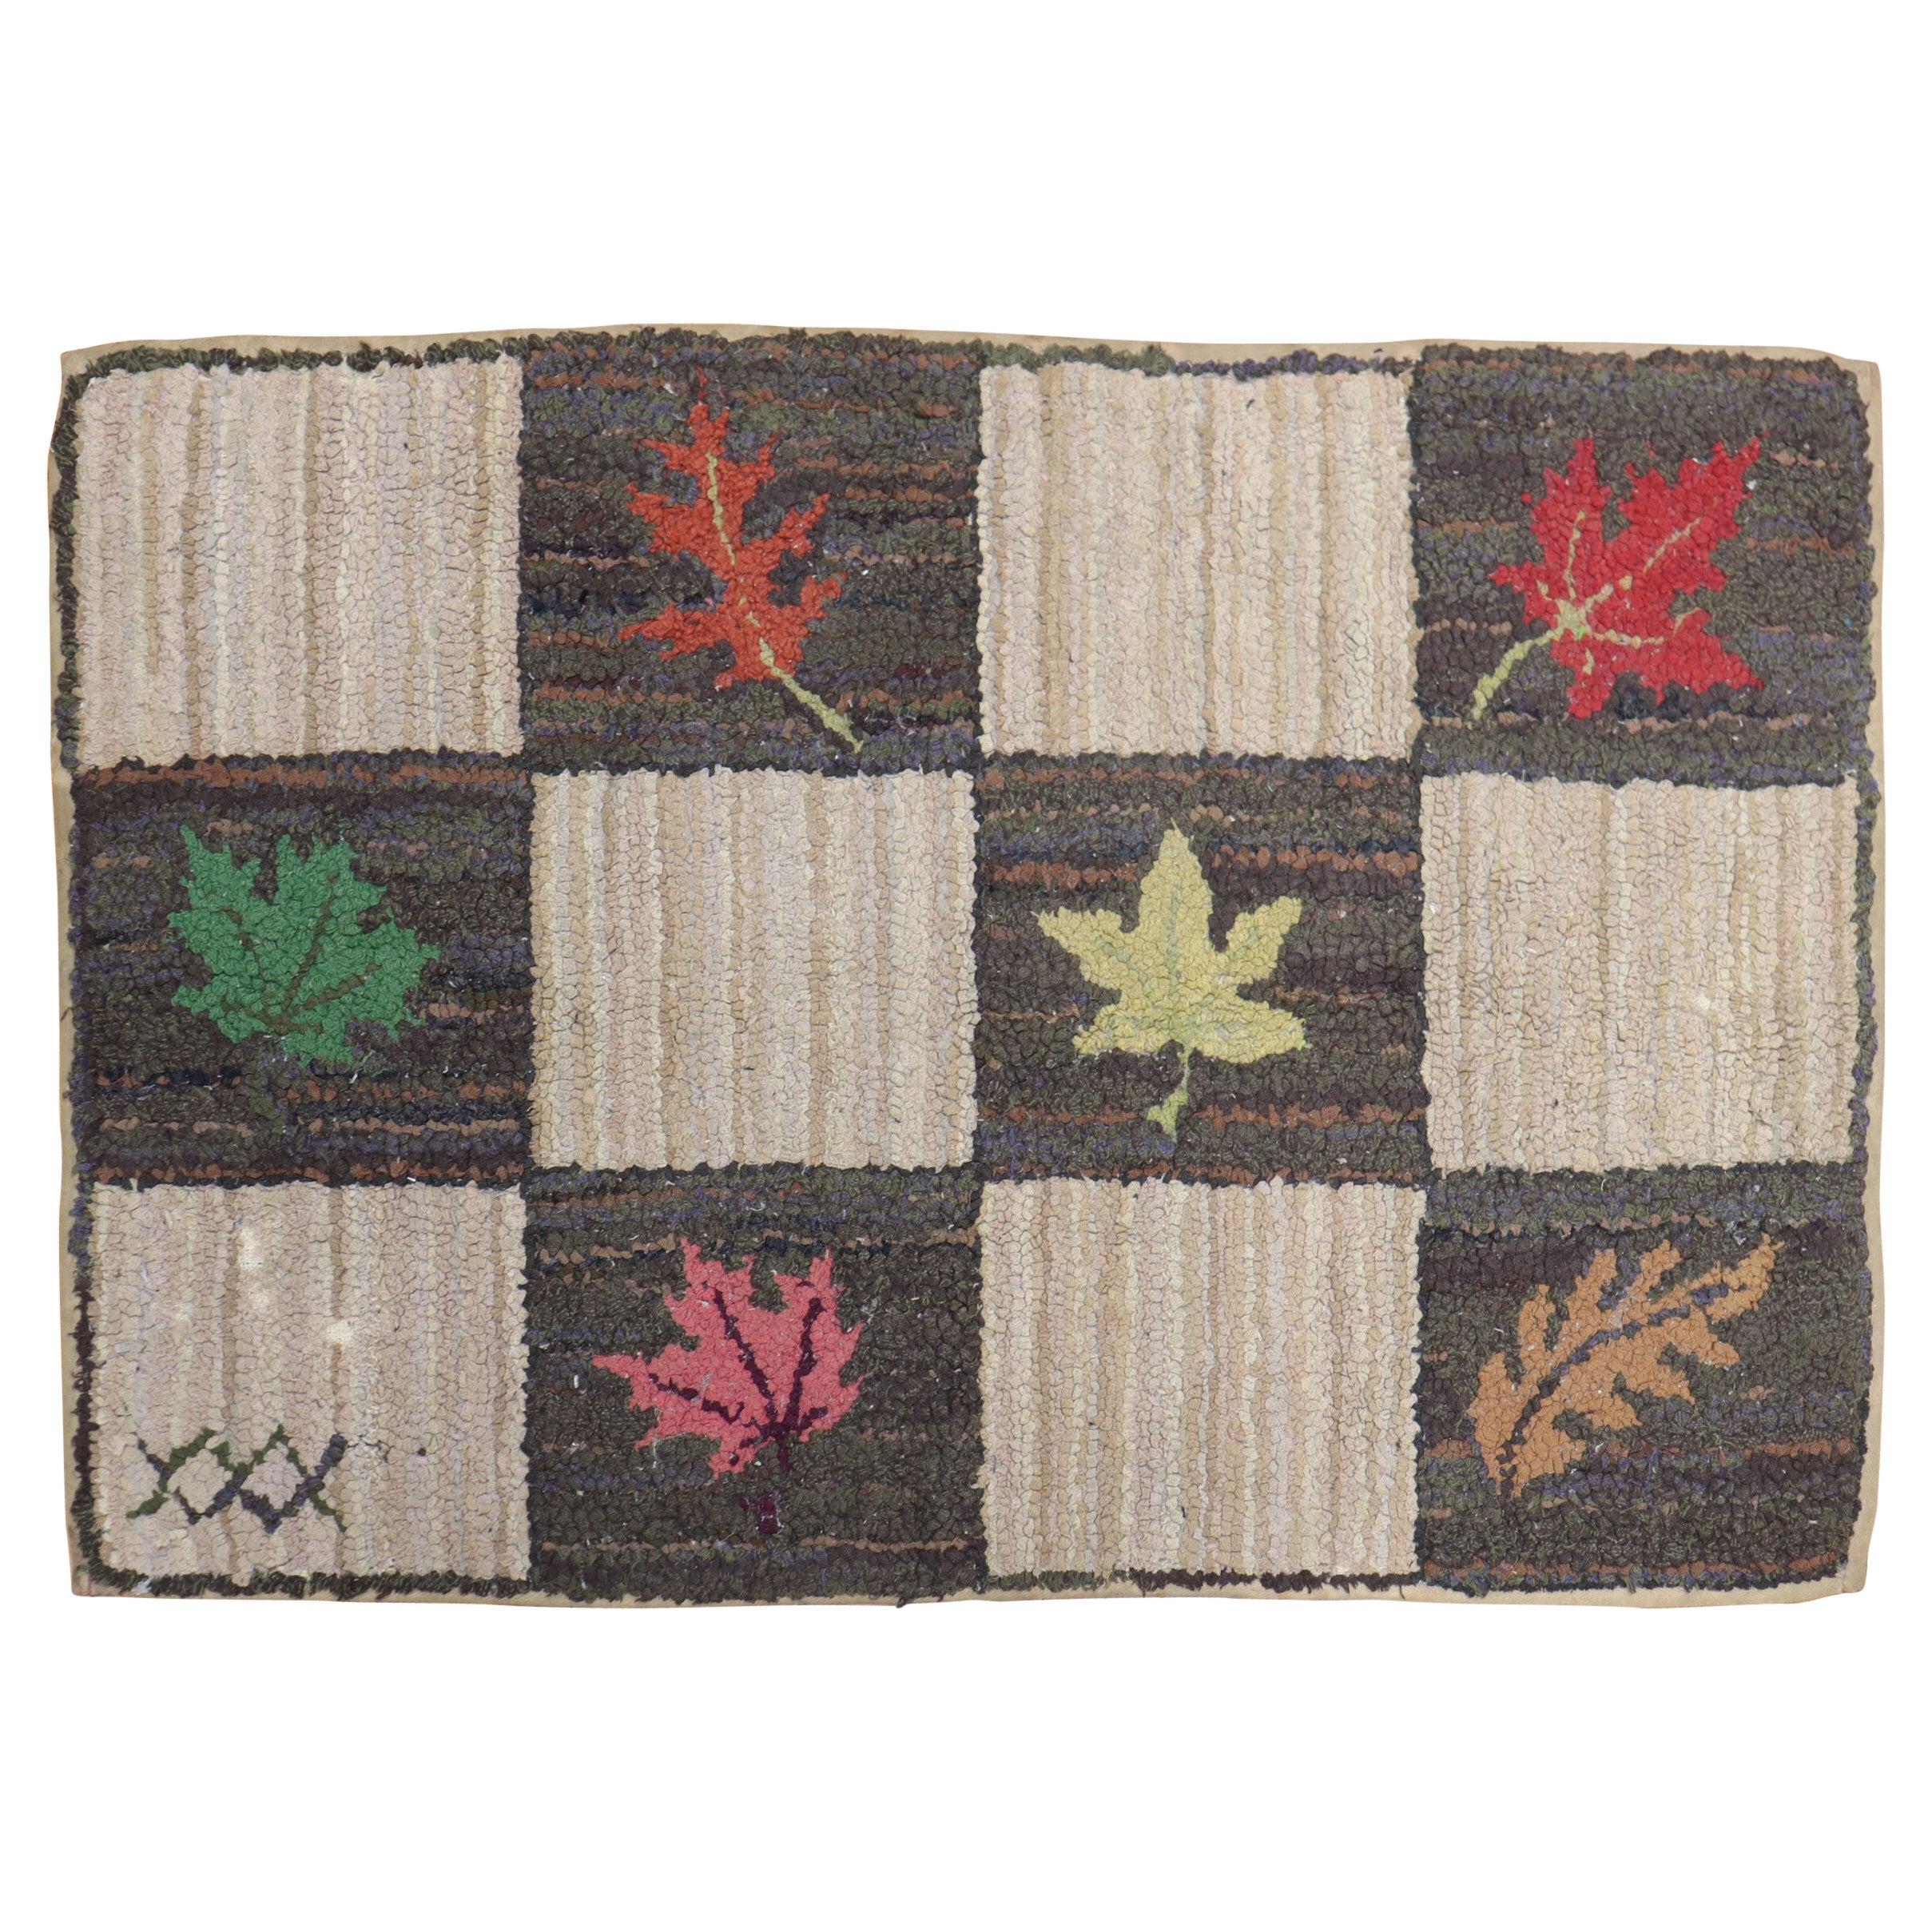 American Hooked Floral Rug